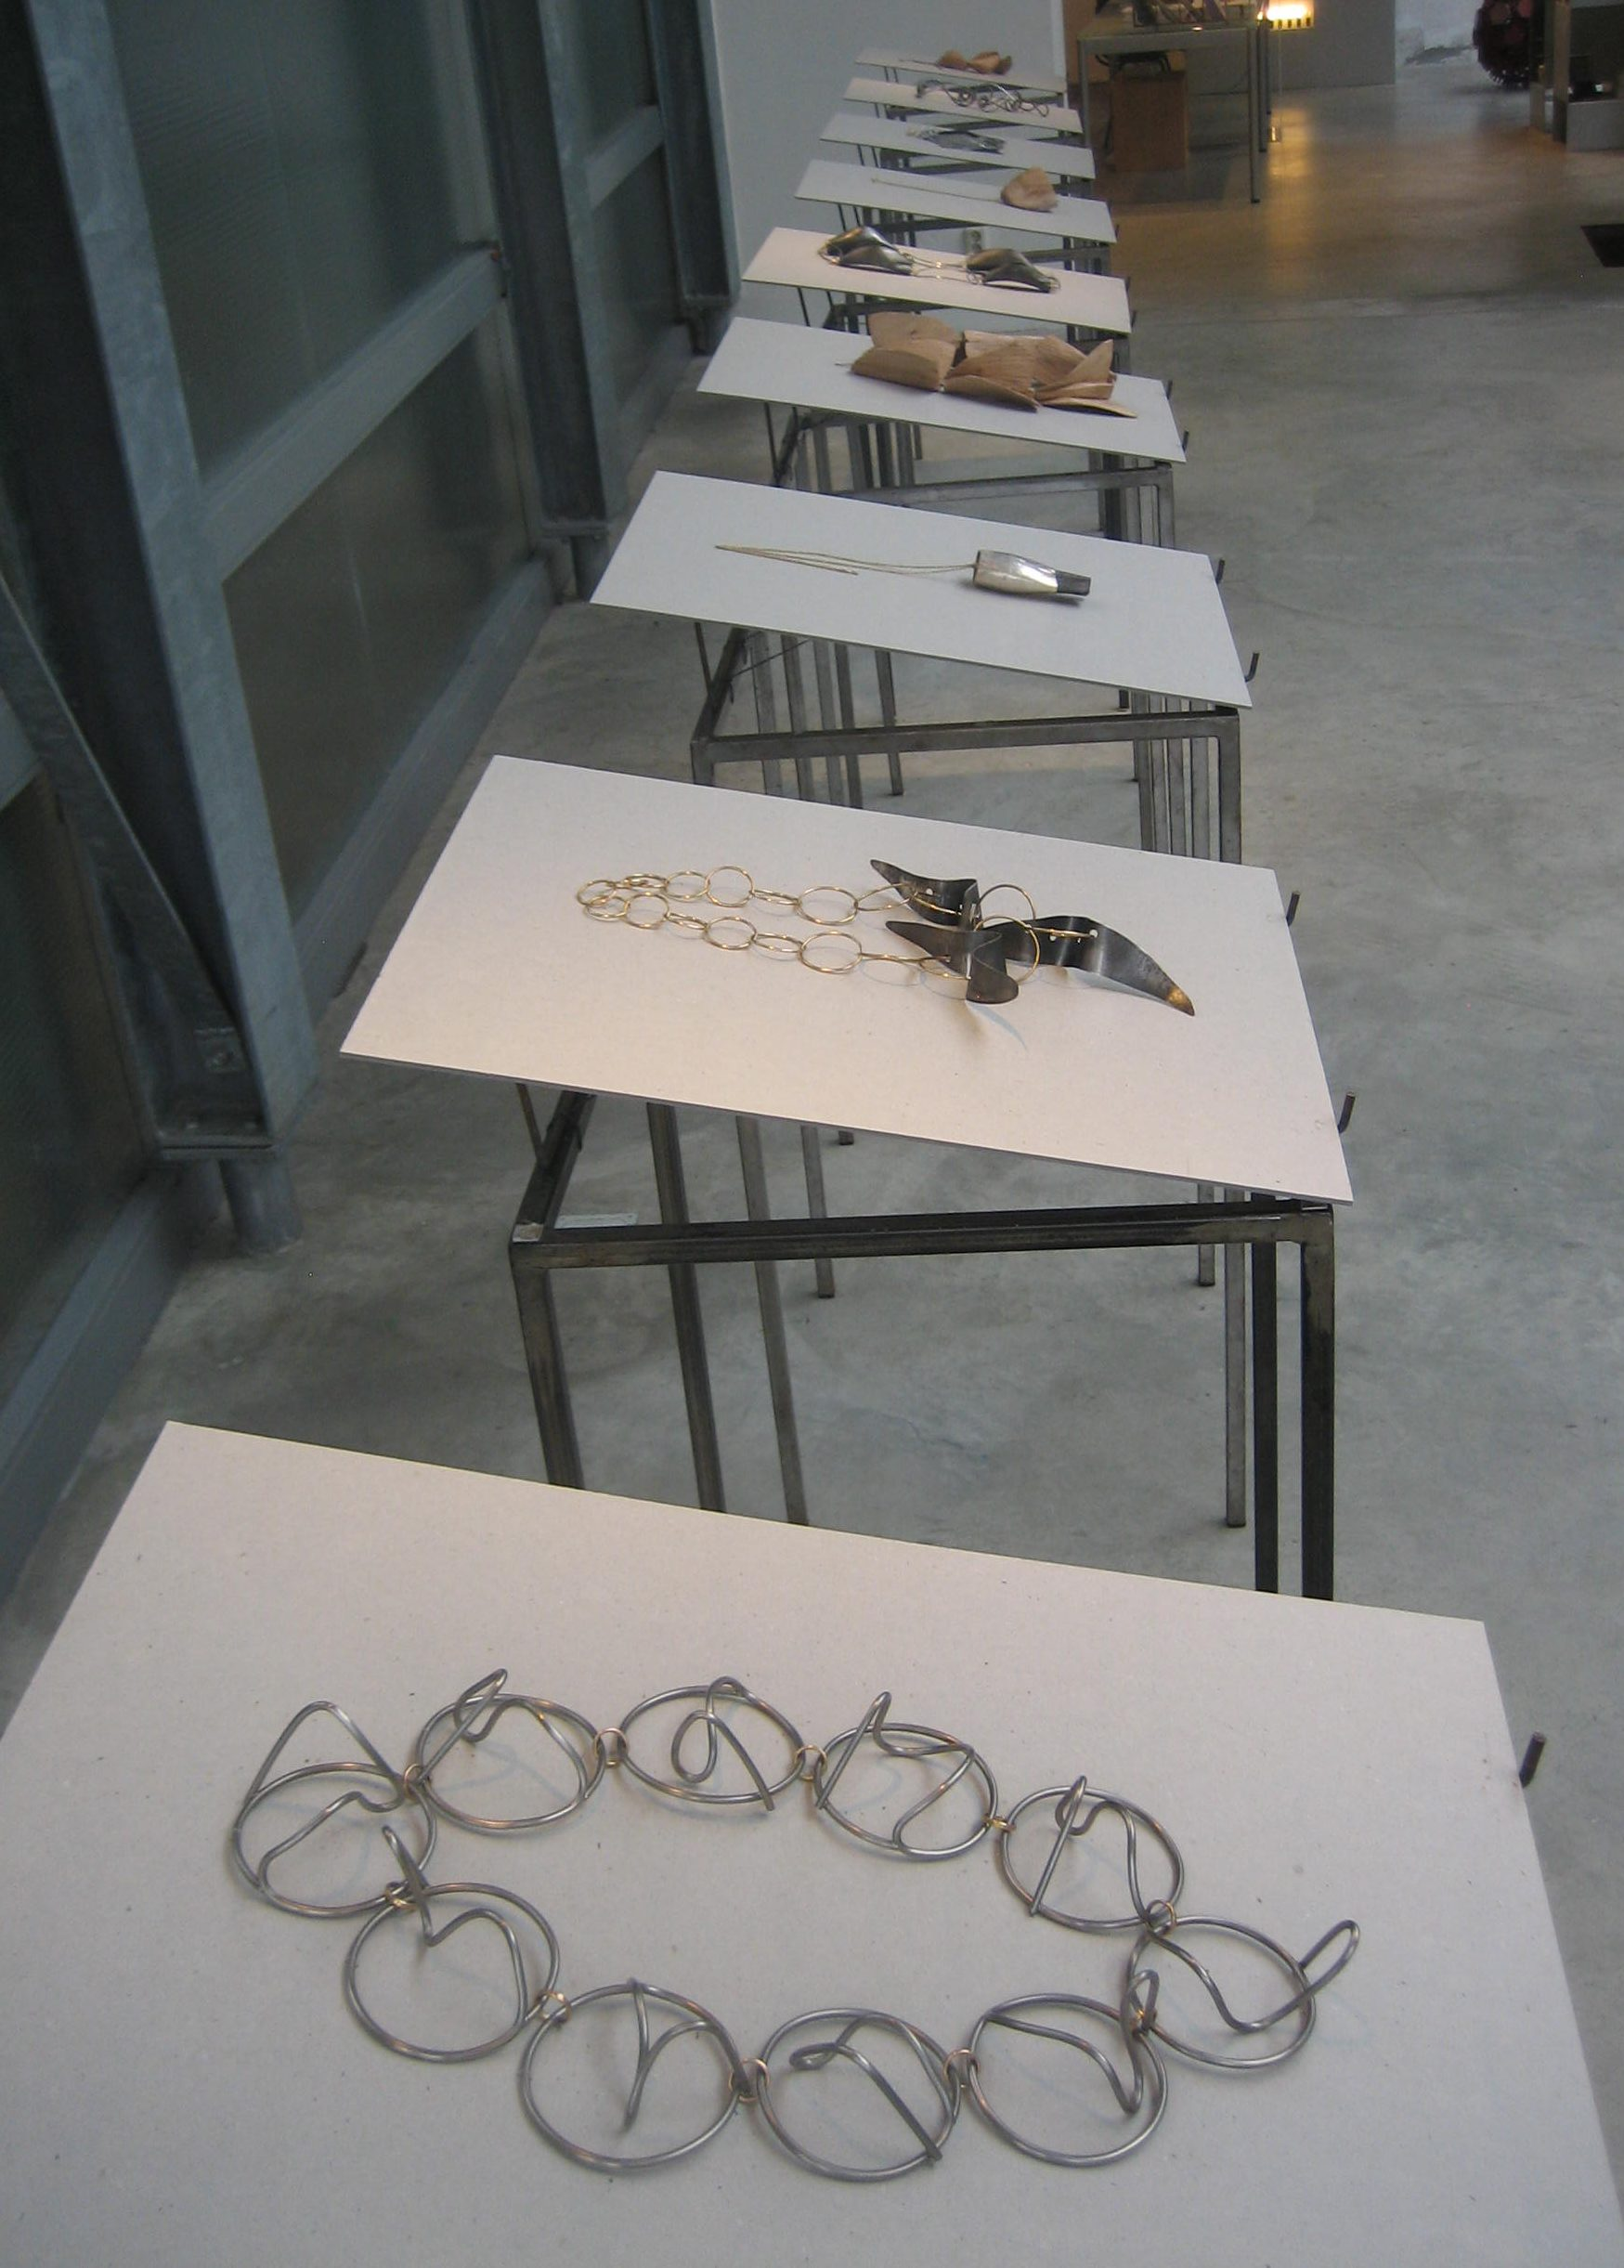 Dorothea Prühl, halssieraden. Galerie Marzee, januari 2018, tentoonstelling